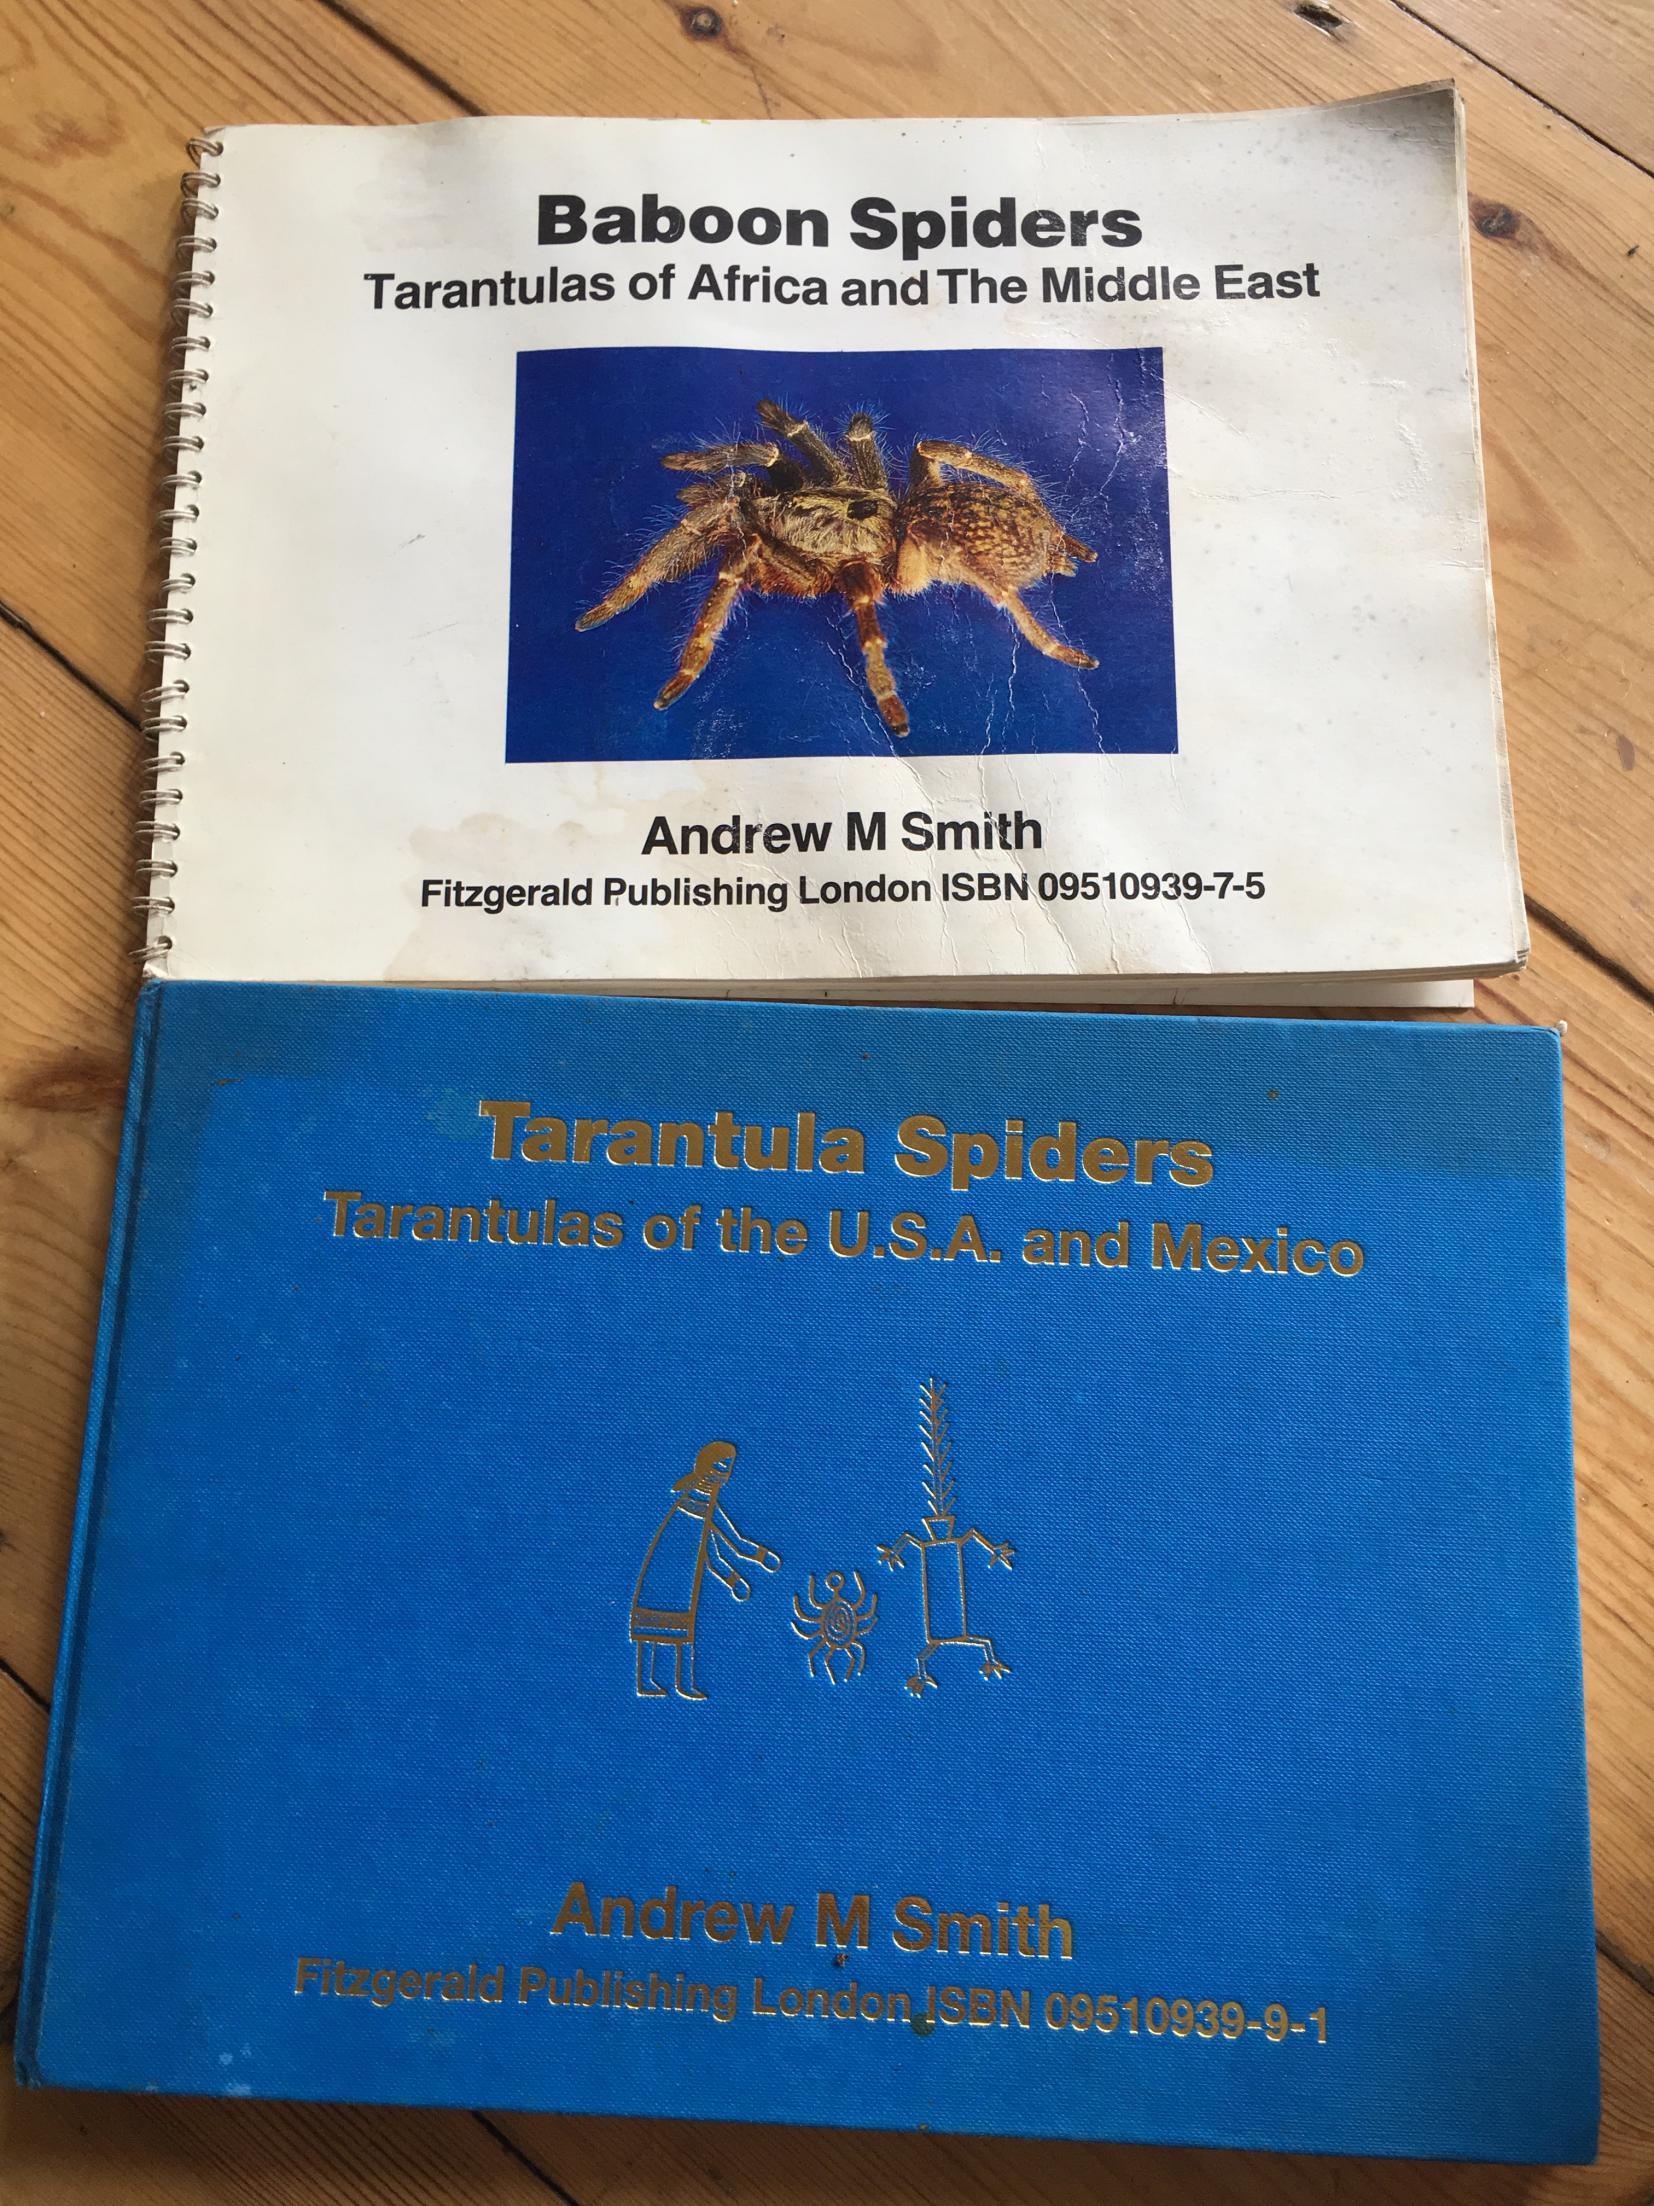 Andrew Smith rare tarantula books-image.jpg